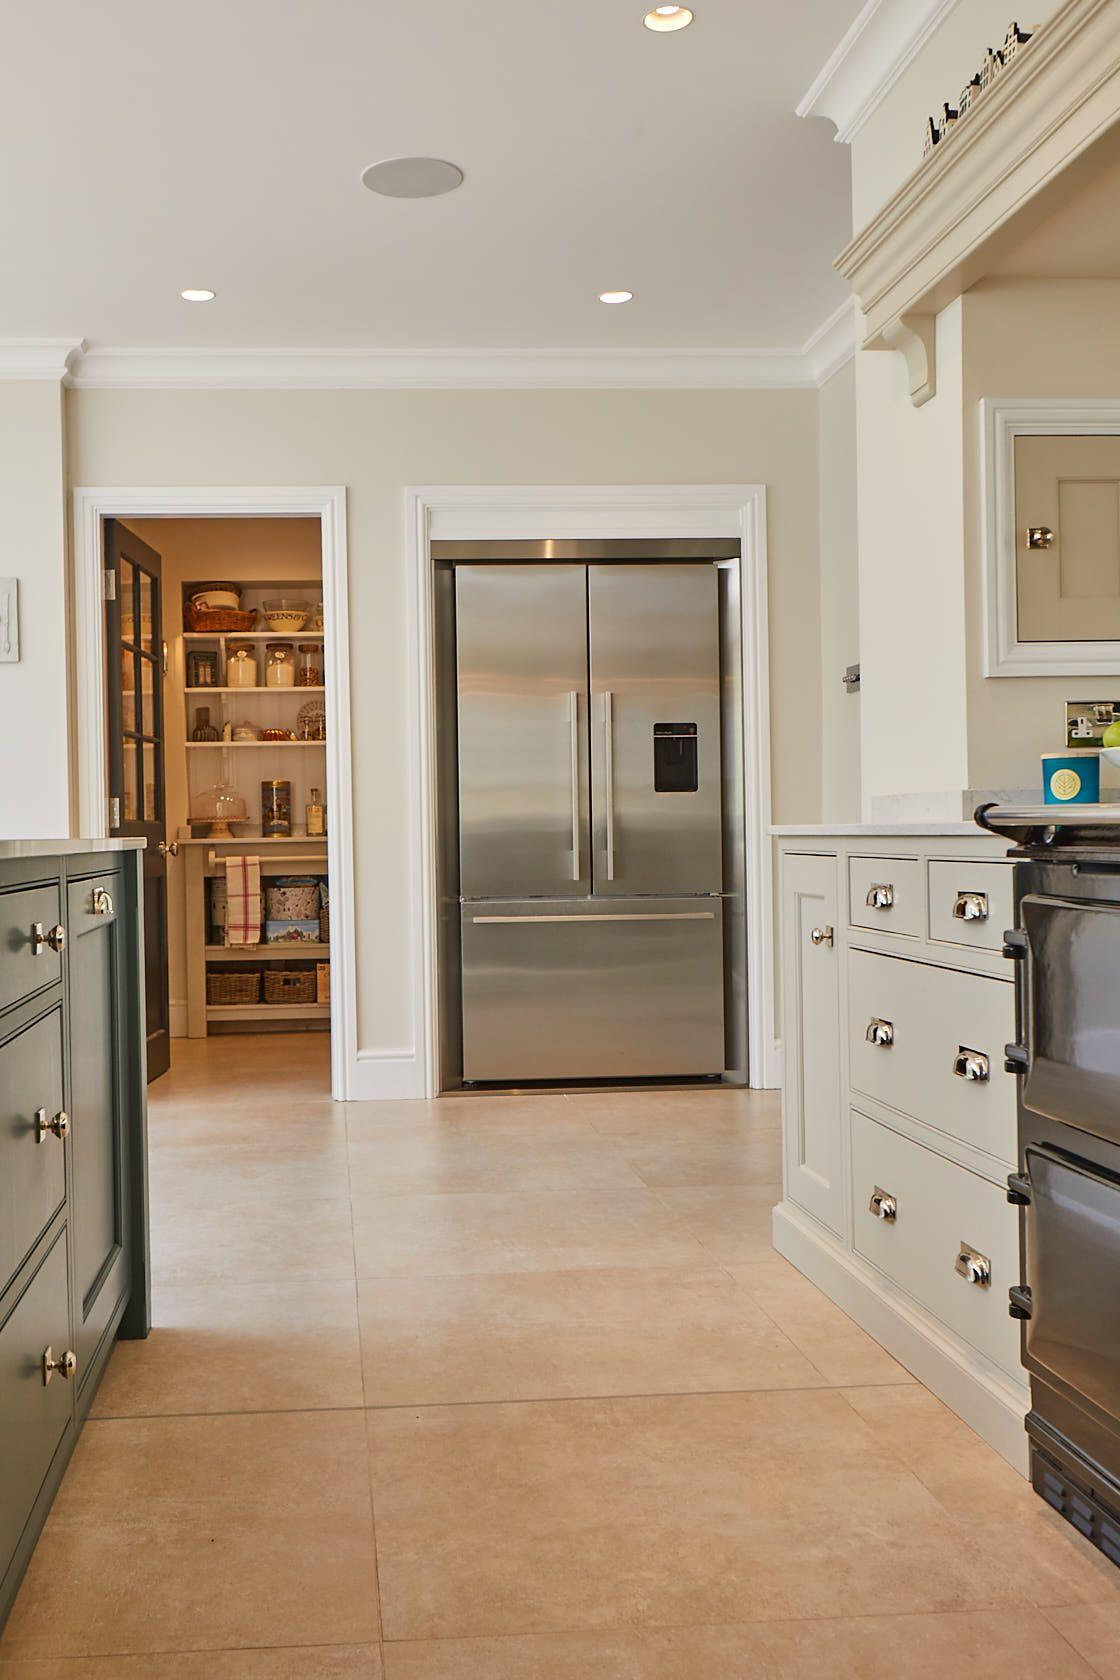 Fisher Paykel Stainless Steel Fridge Freezer In 2020 Bespoke Kitchens Elegant Kitchen Design Open Plan Kitchen Living Room